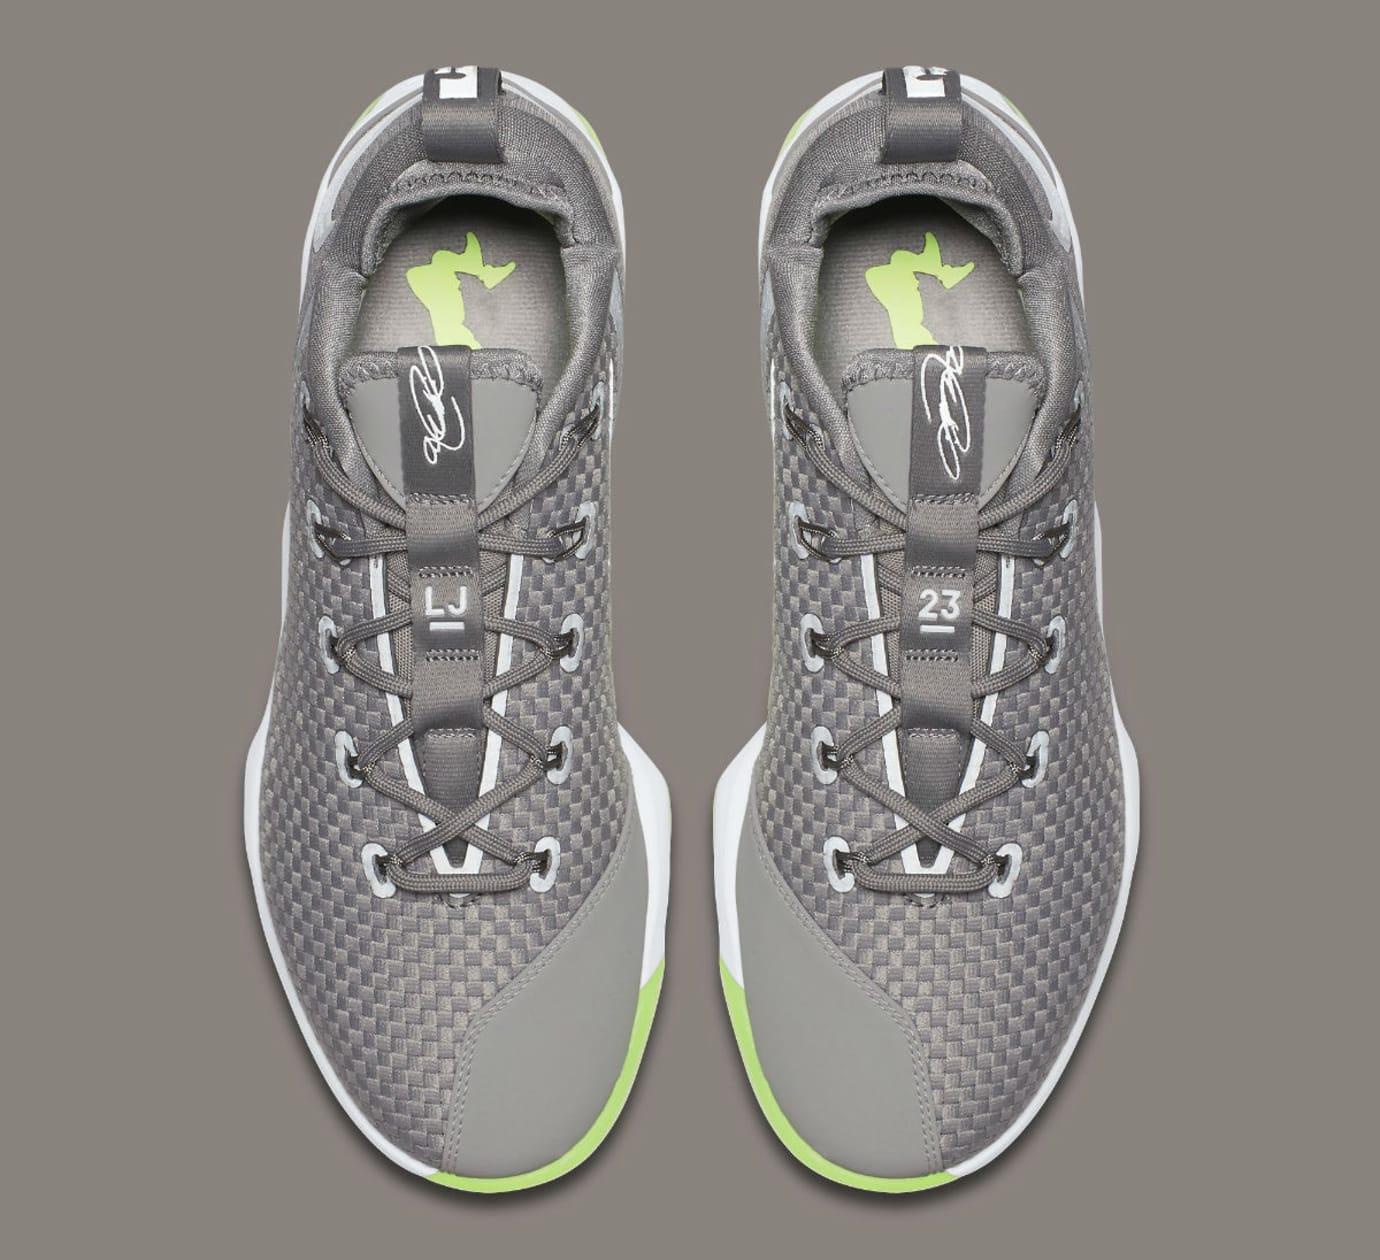 Nike LeBron 14 Low Dunkman Release Date Top 878636-005